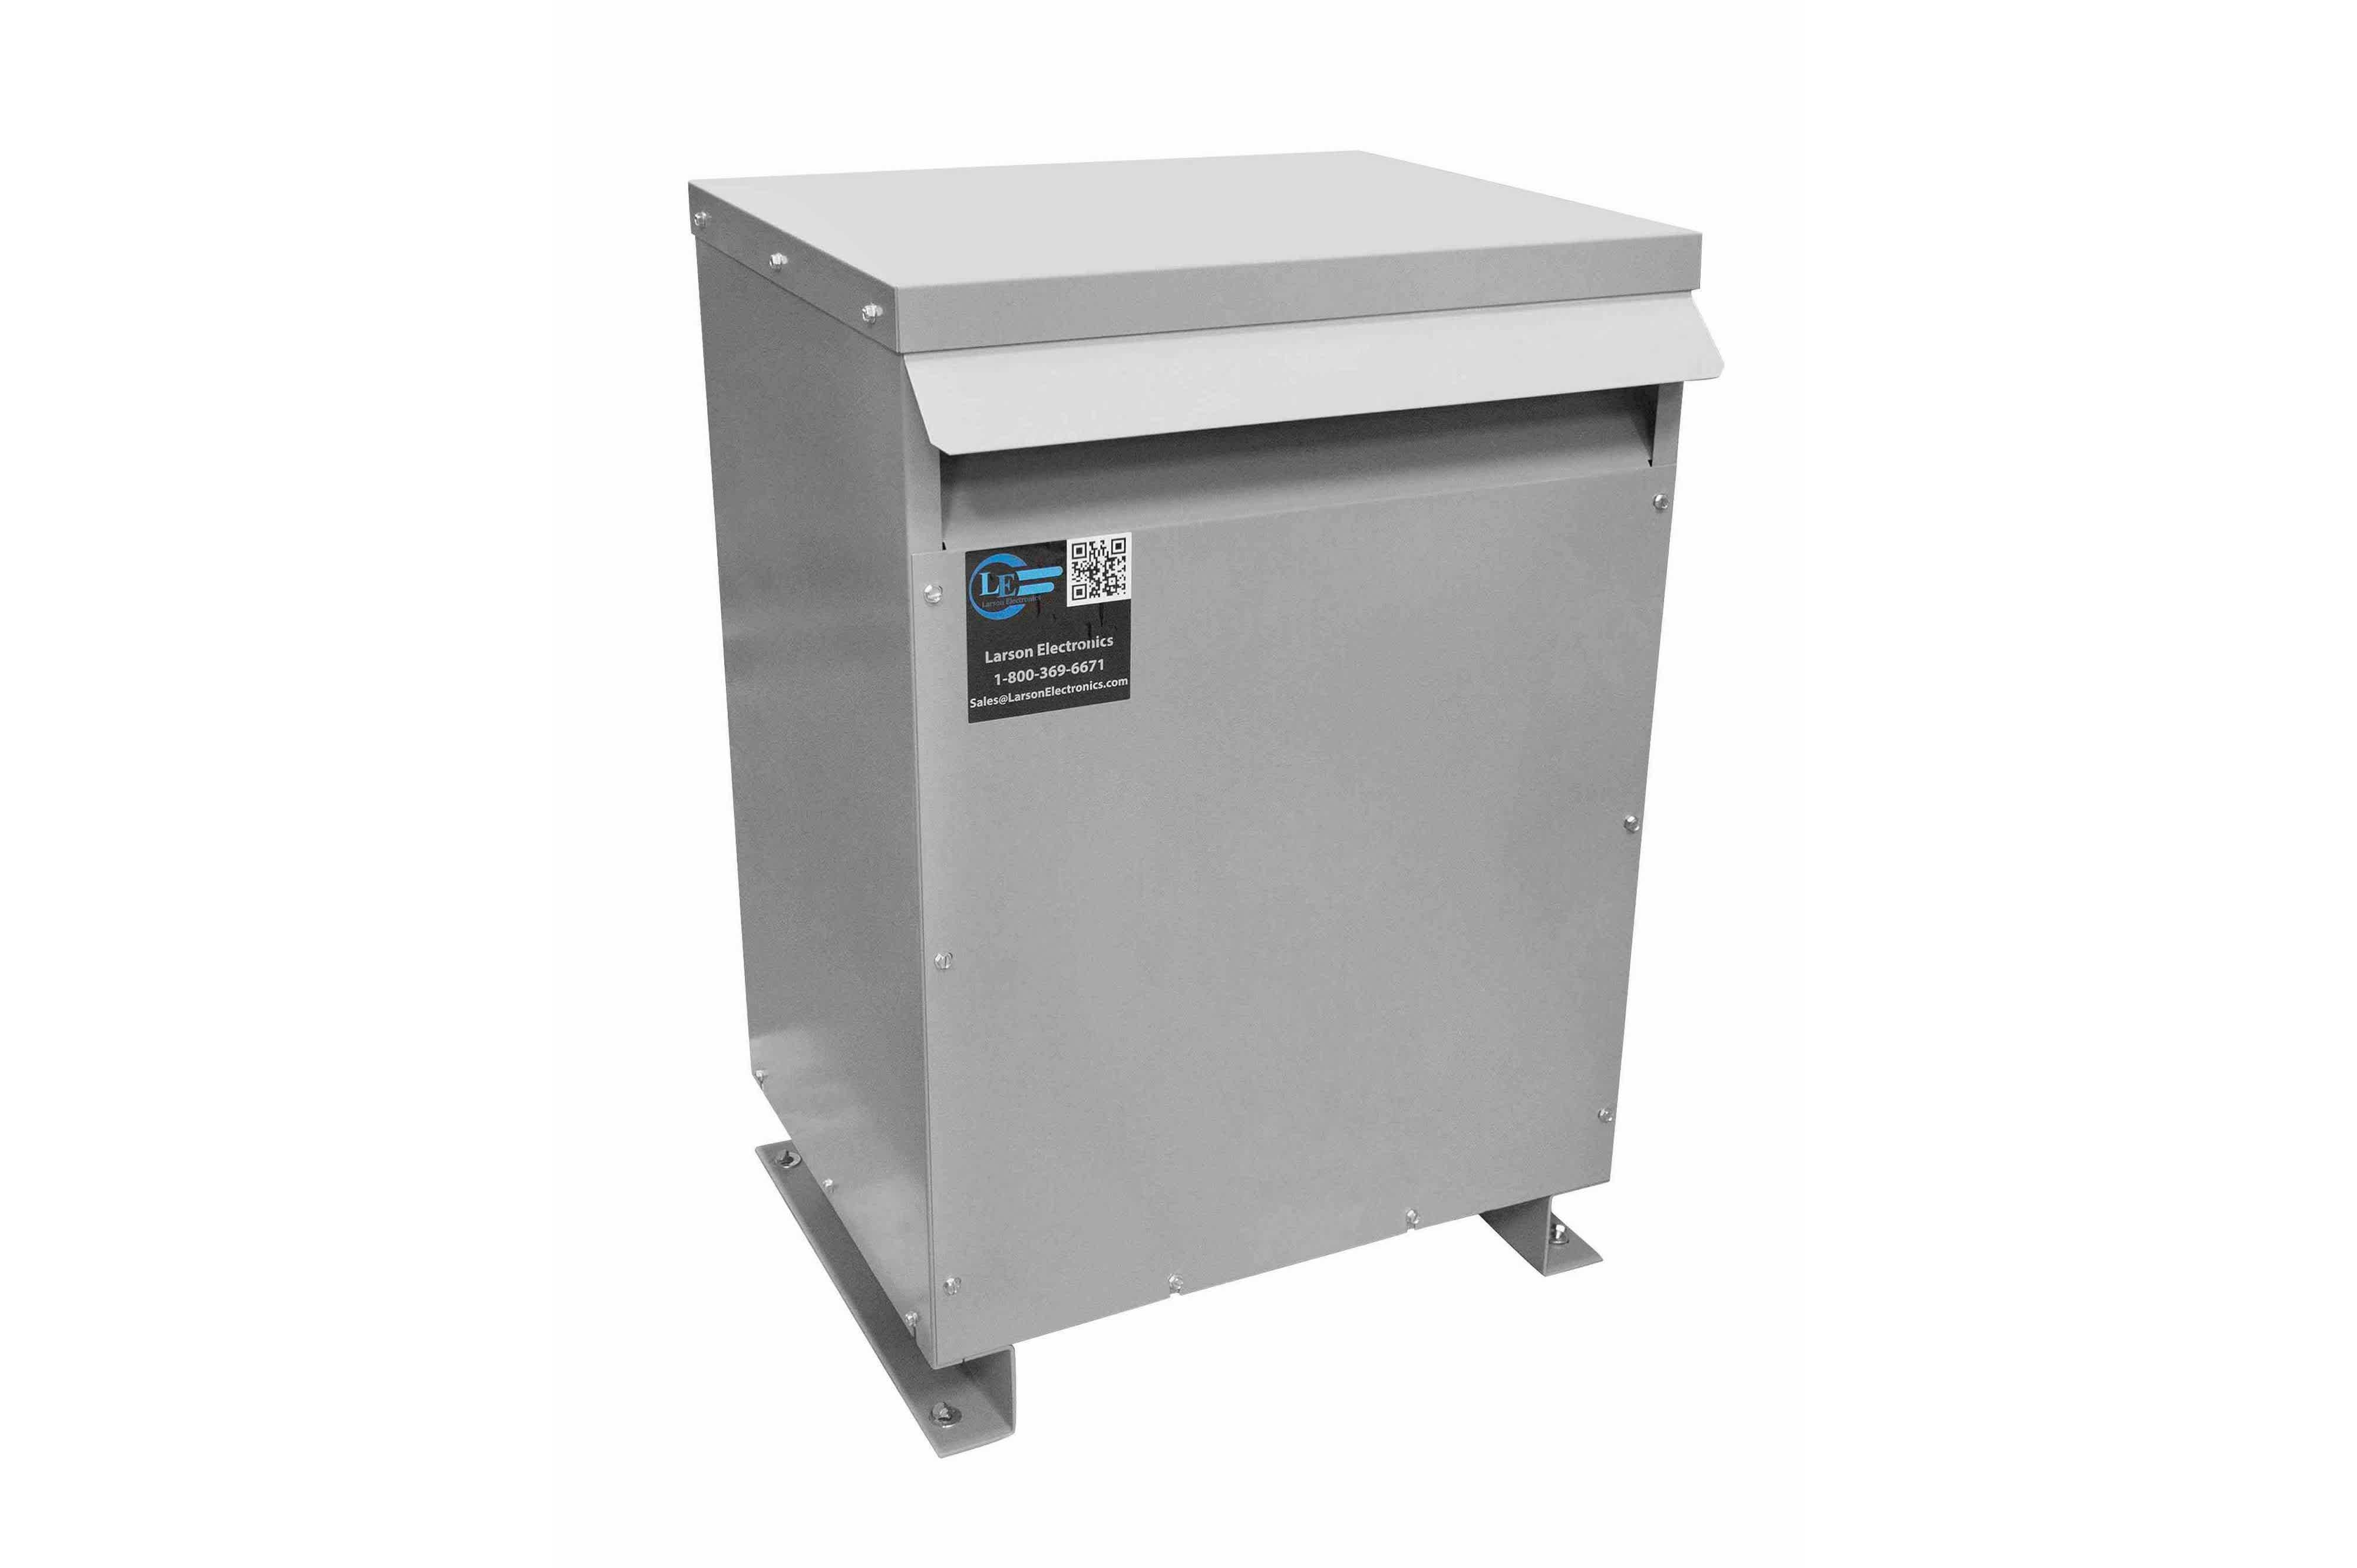 30 kVA 3PH Isolation Transformer, 460V Wye Primary, 240V/120 Delta Secondary, N3R, Ventilated, 60 Hz